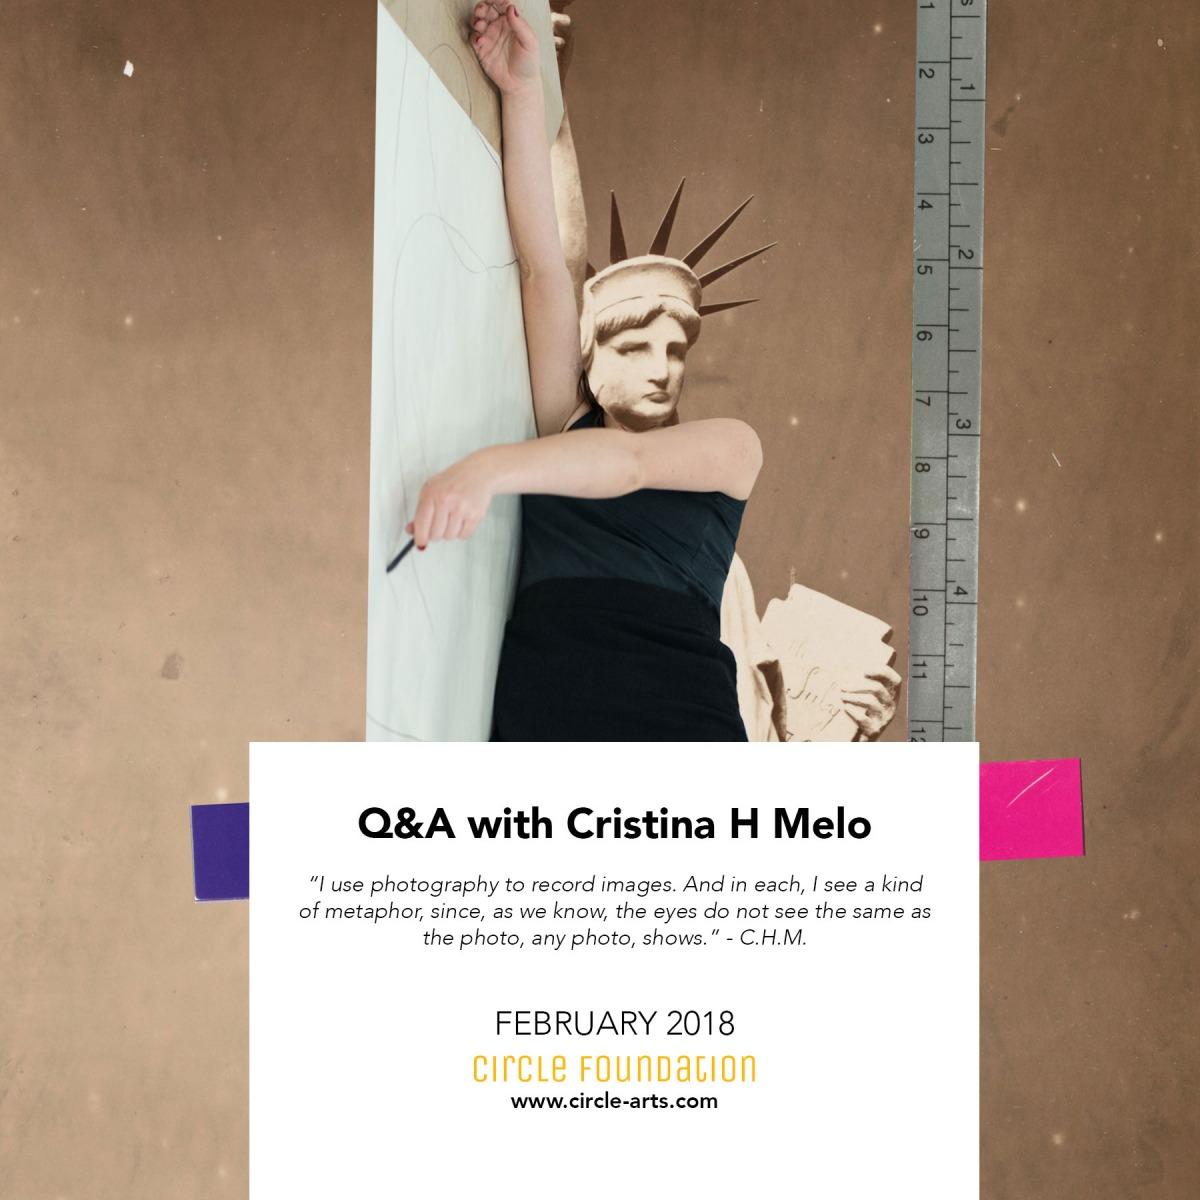 Q&A with Cristina H Melo